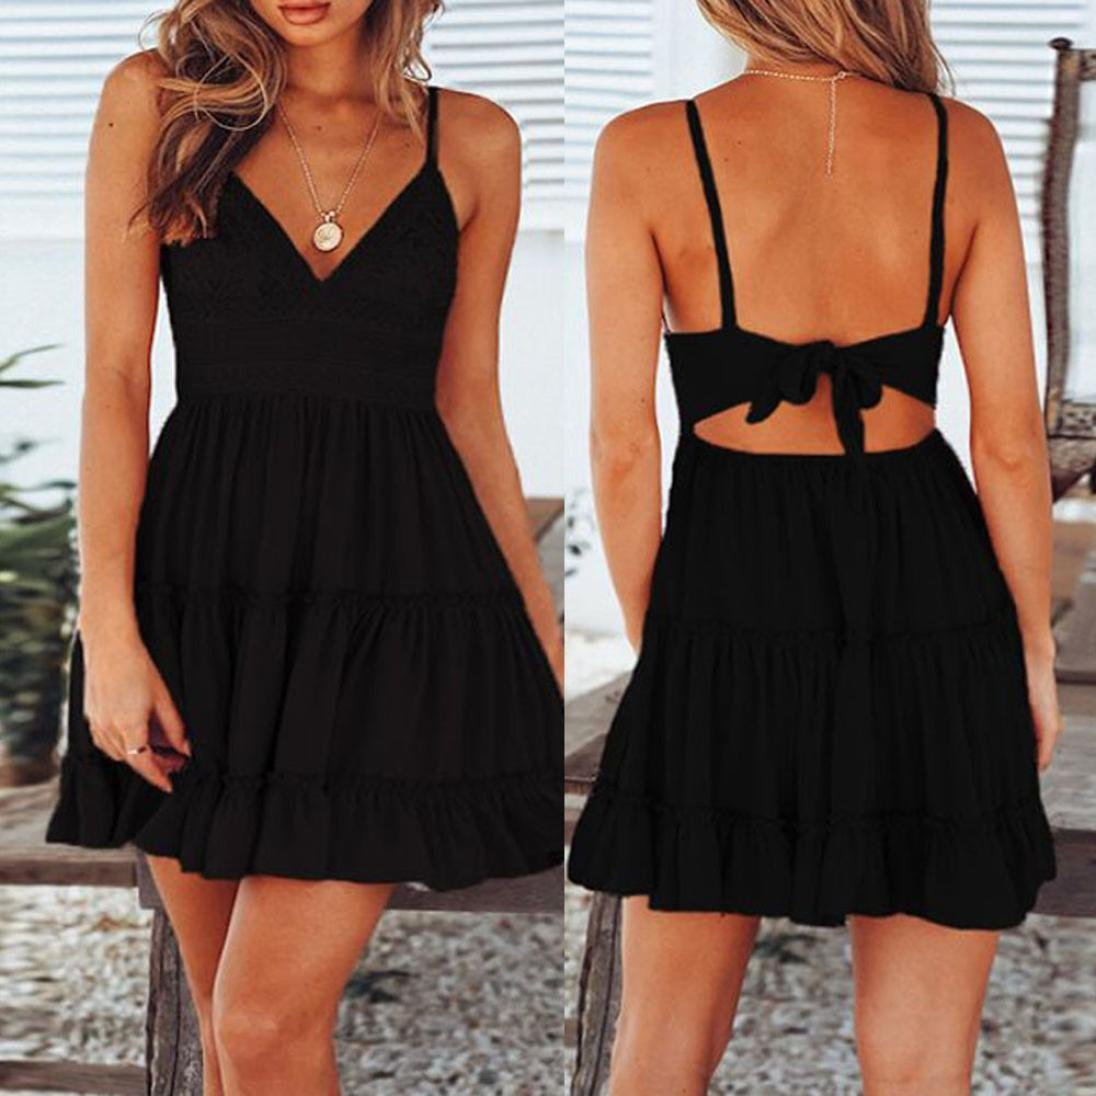 DAYLIN Women Fashion Summer Backless Mini White Evening Party Beach Lace Dress Sundress: Amazon.co.uk: Clothing